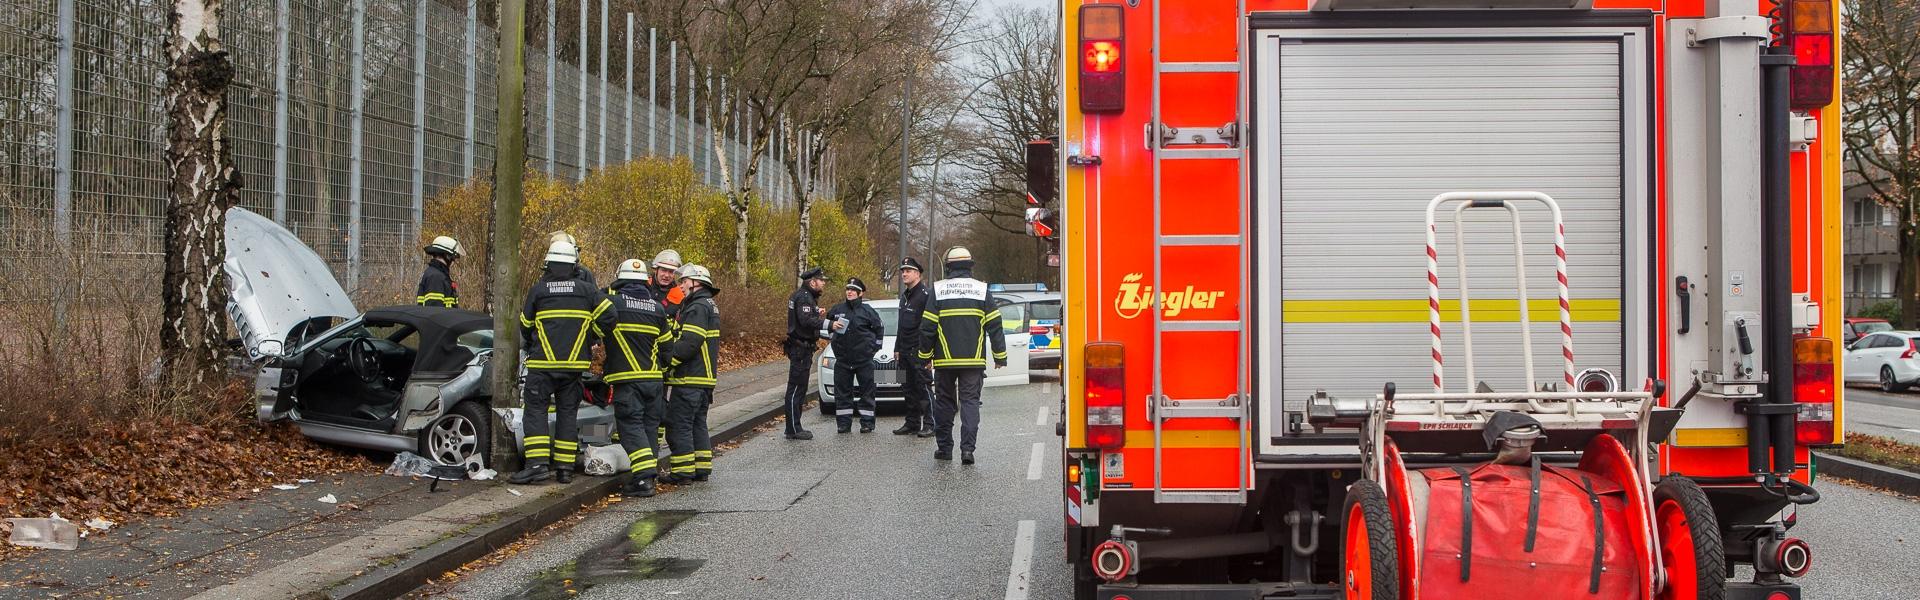 09.12.2018 – Unfall auf regennasser Fahrbahn am Stadtpark